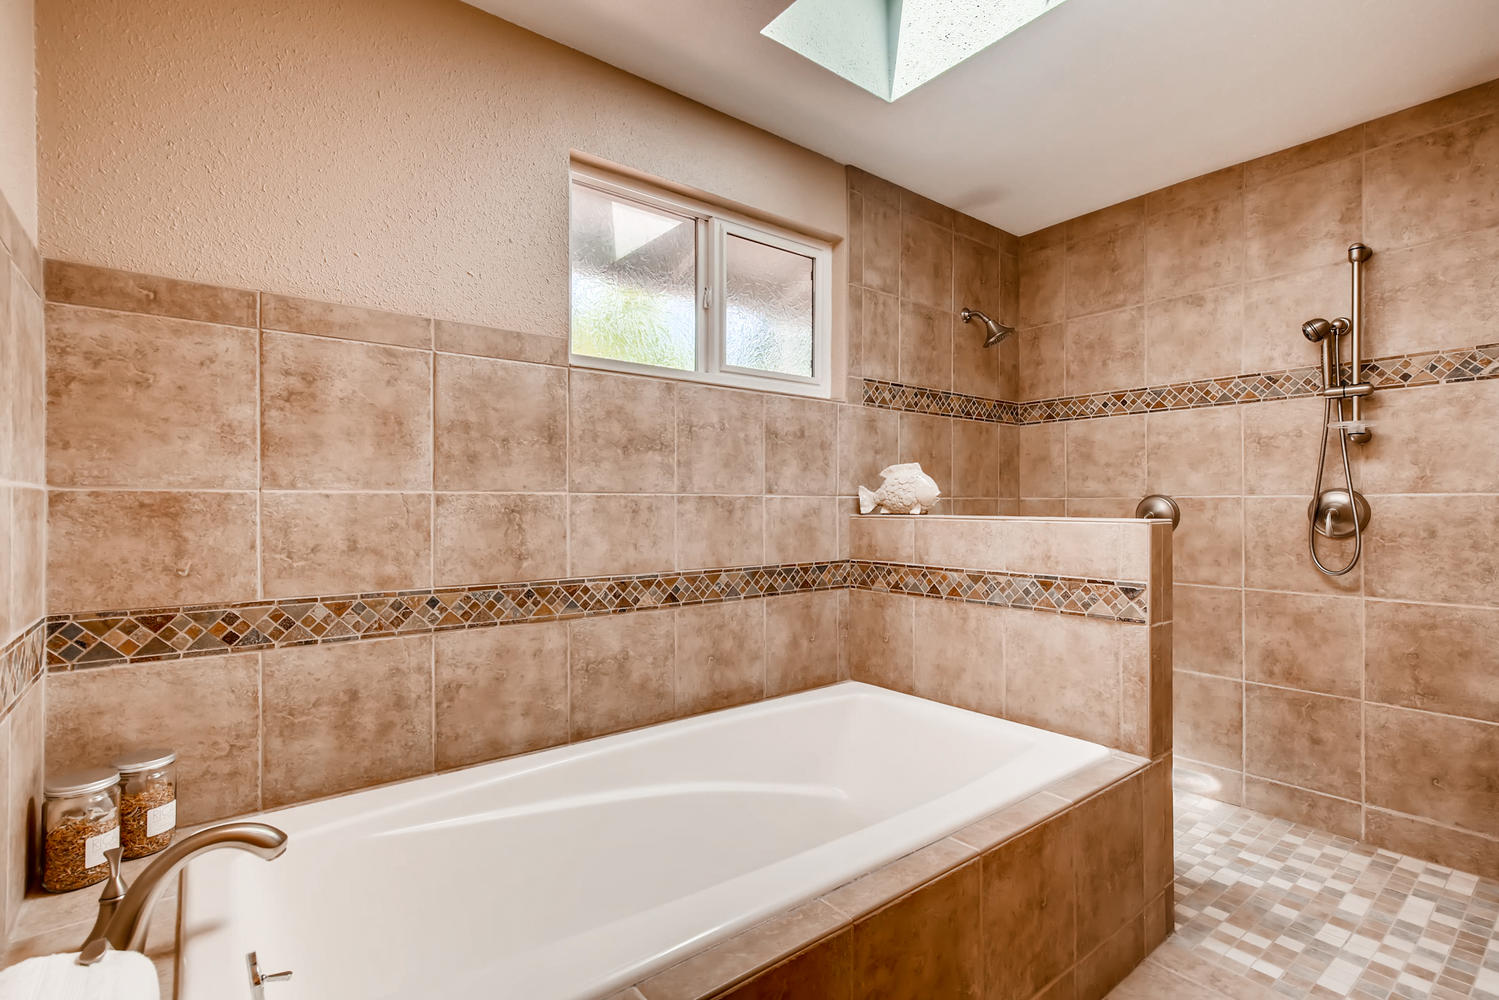 22224 3rd Ave SE Bothell WA-large-015-16-Master Bathroom-1500x1000-72dpi.jpg